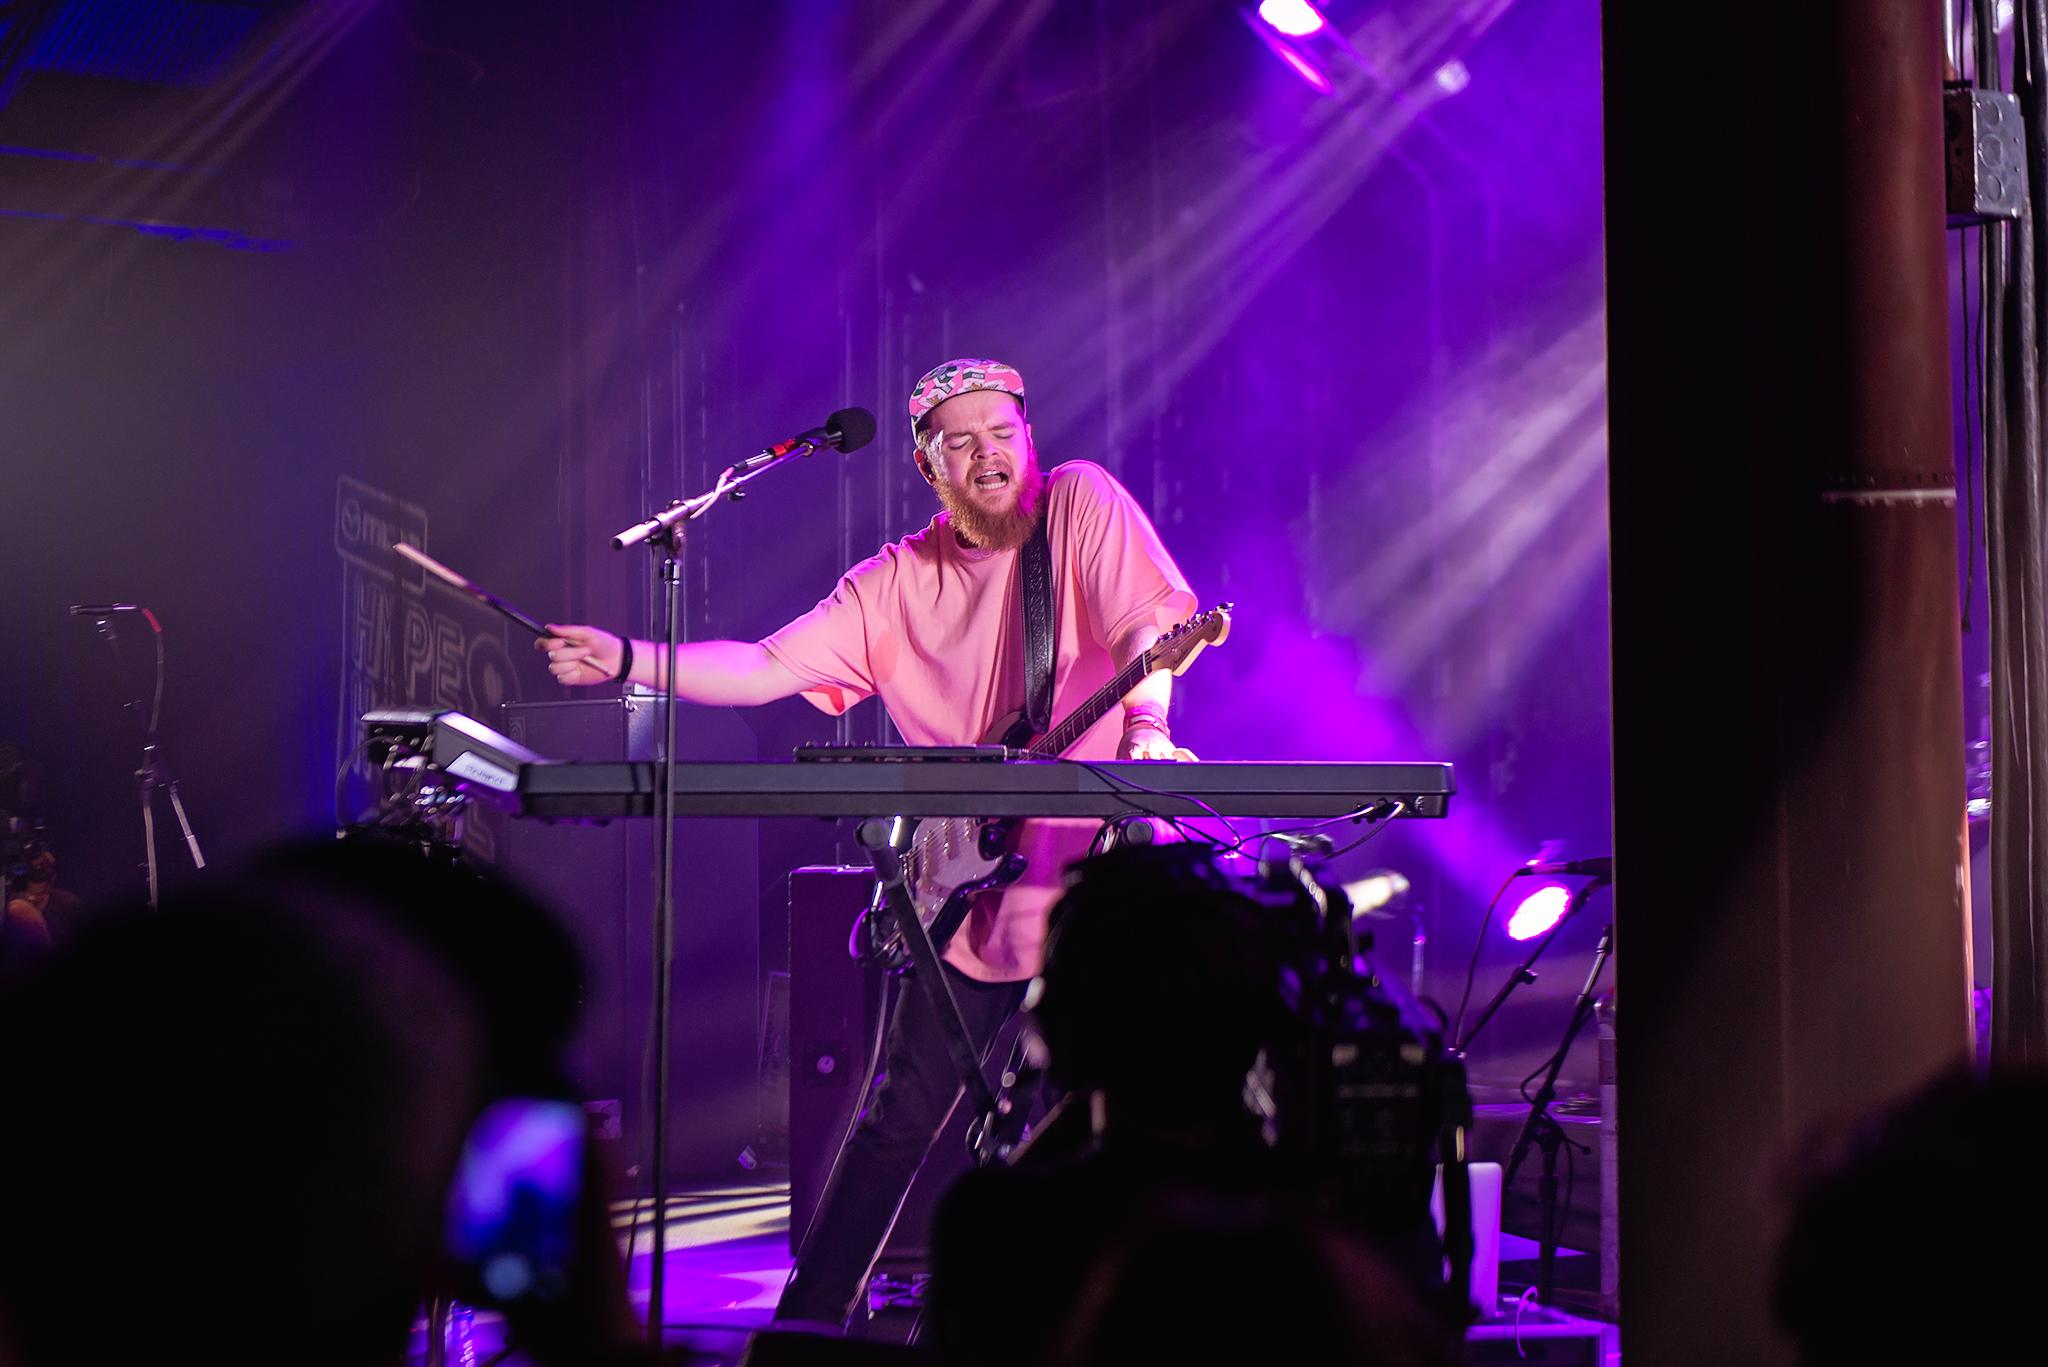 Austin-Concert-Photographer-Jack-Garratt-SXSW-Hype-Hotel-3.jpg